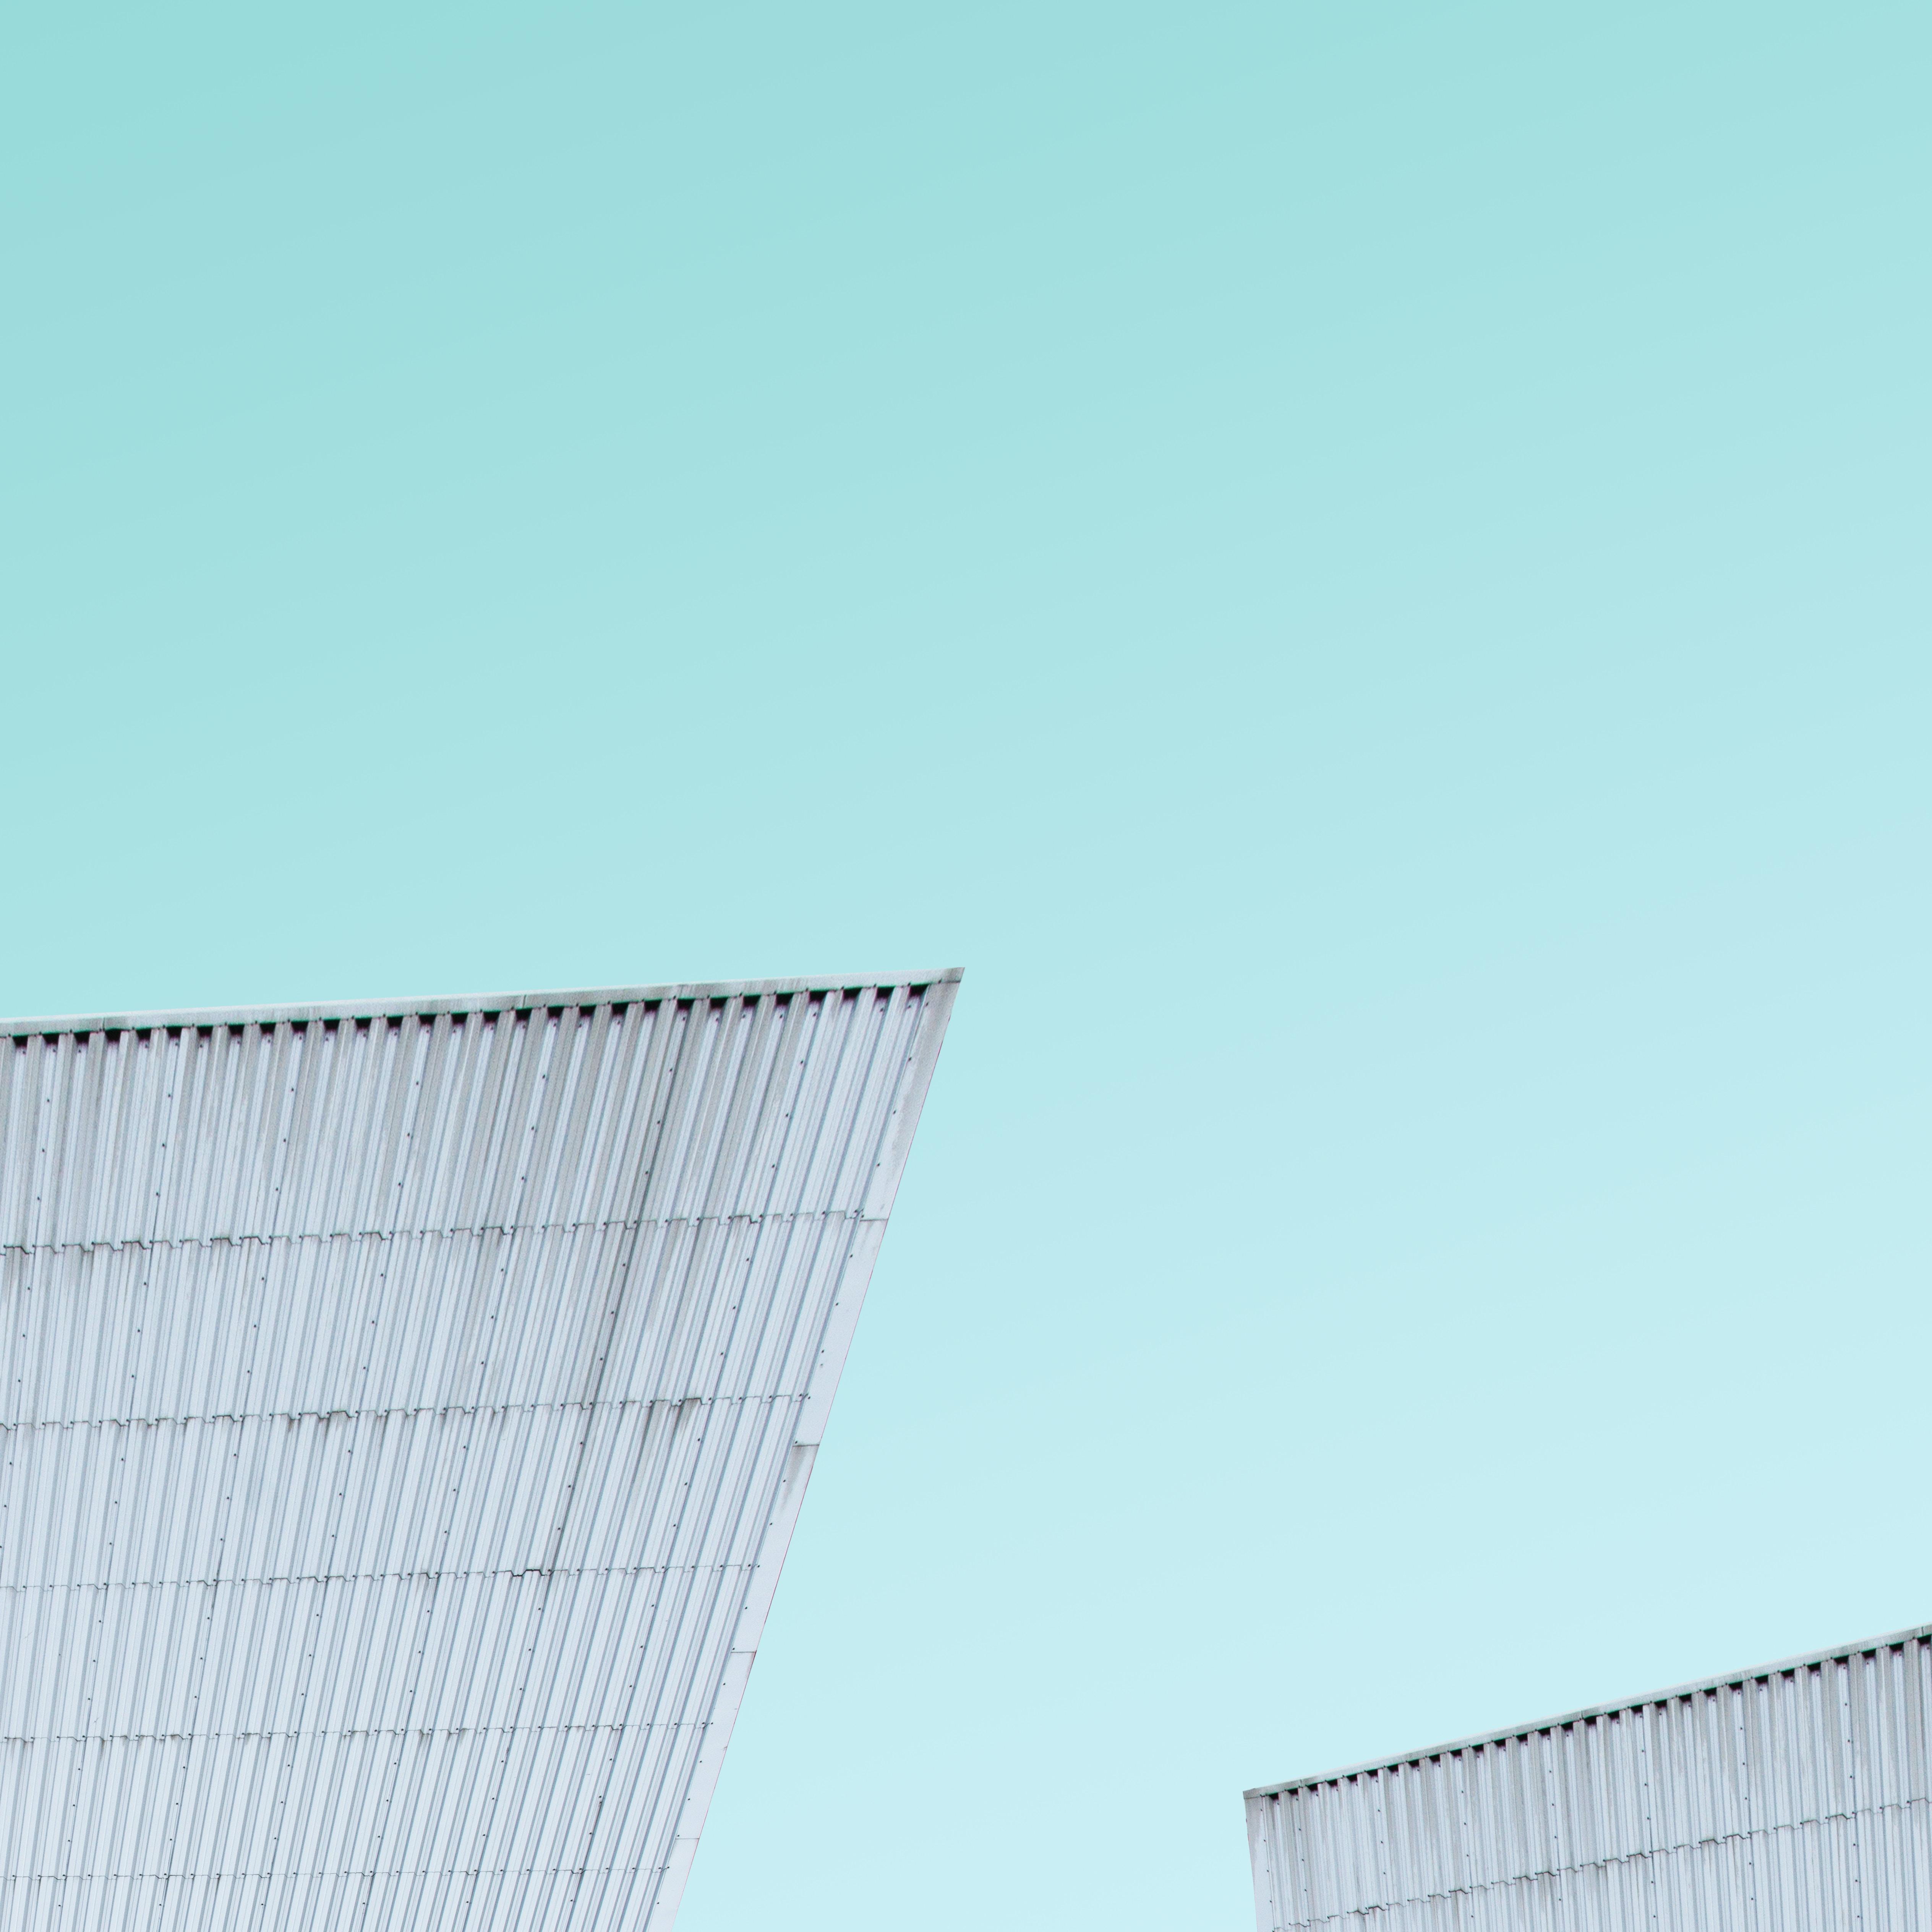 closeup photo of gray sheet